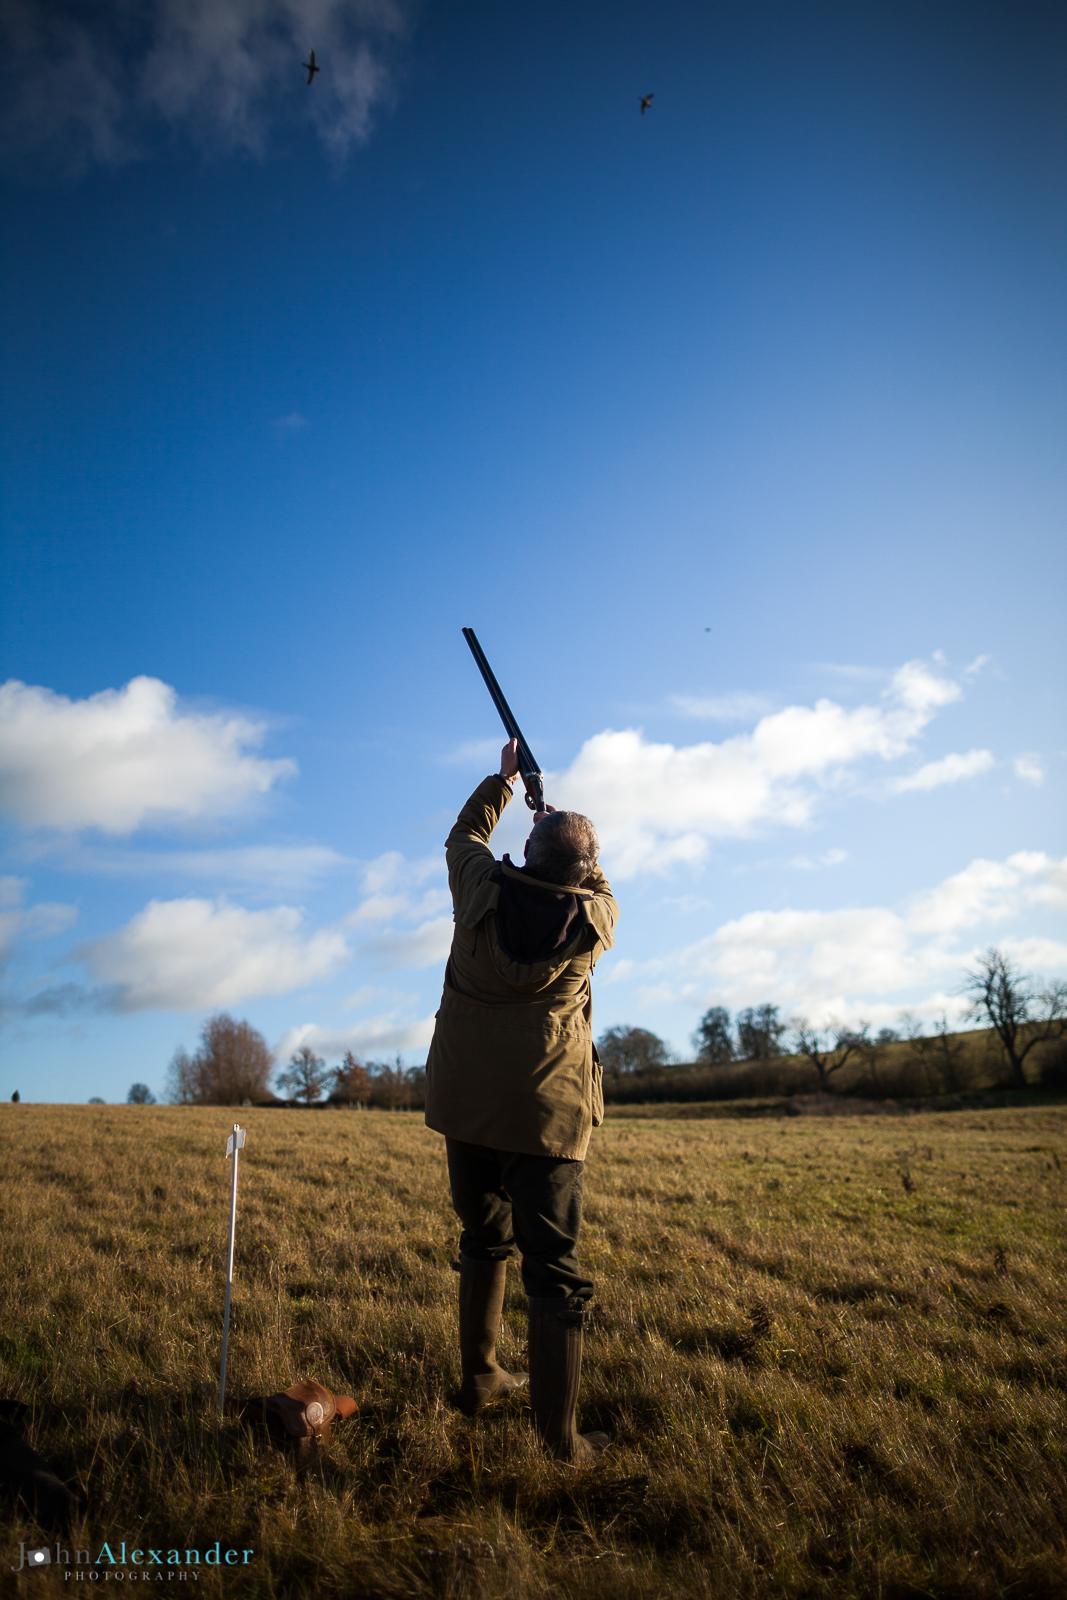 vertical action photo of a gun shooting pheasants